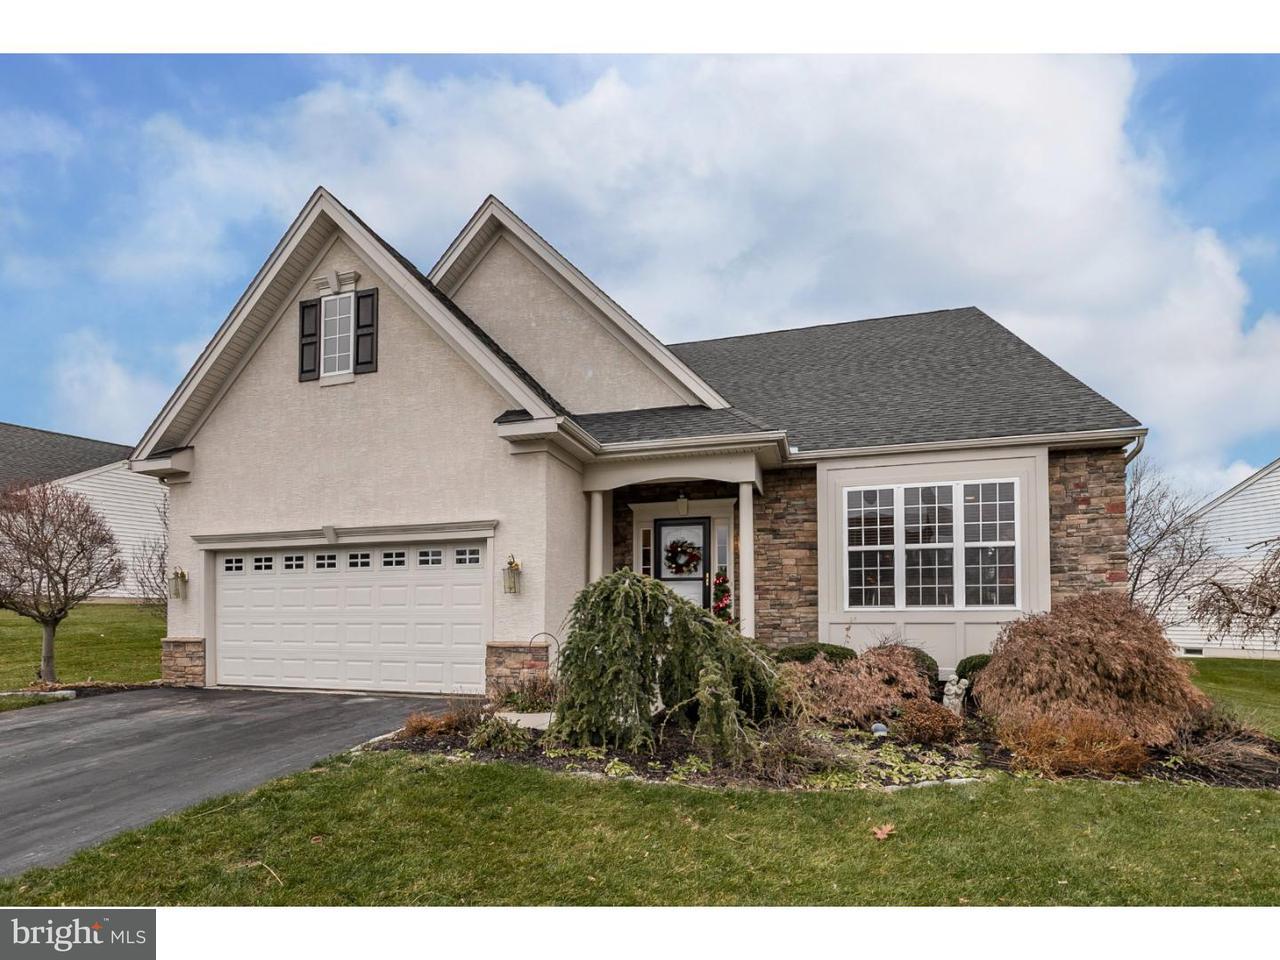 Single Family Home for Sale at 19 PAR Circle Limerick, Pennsylvania 19464 United States